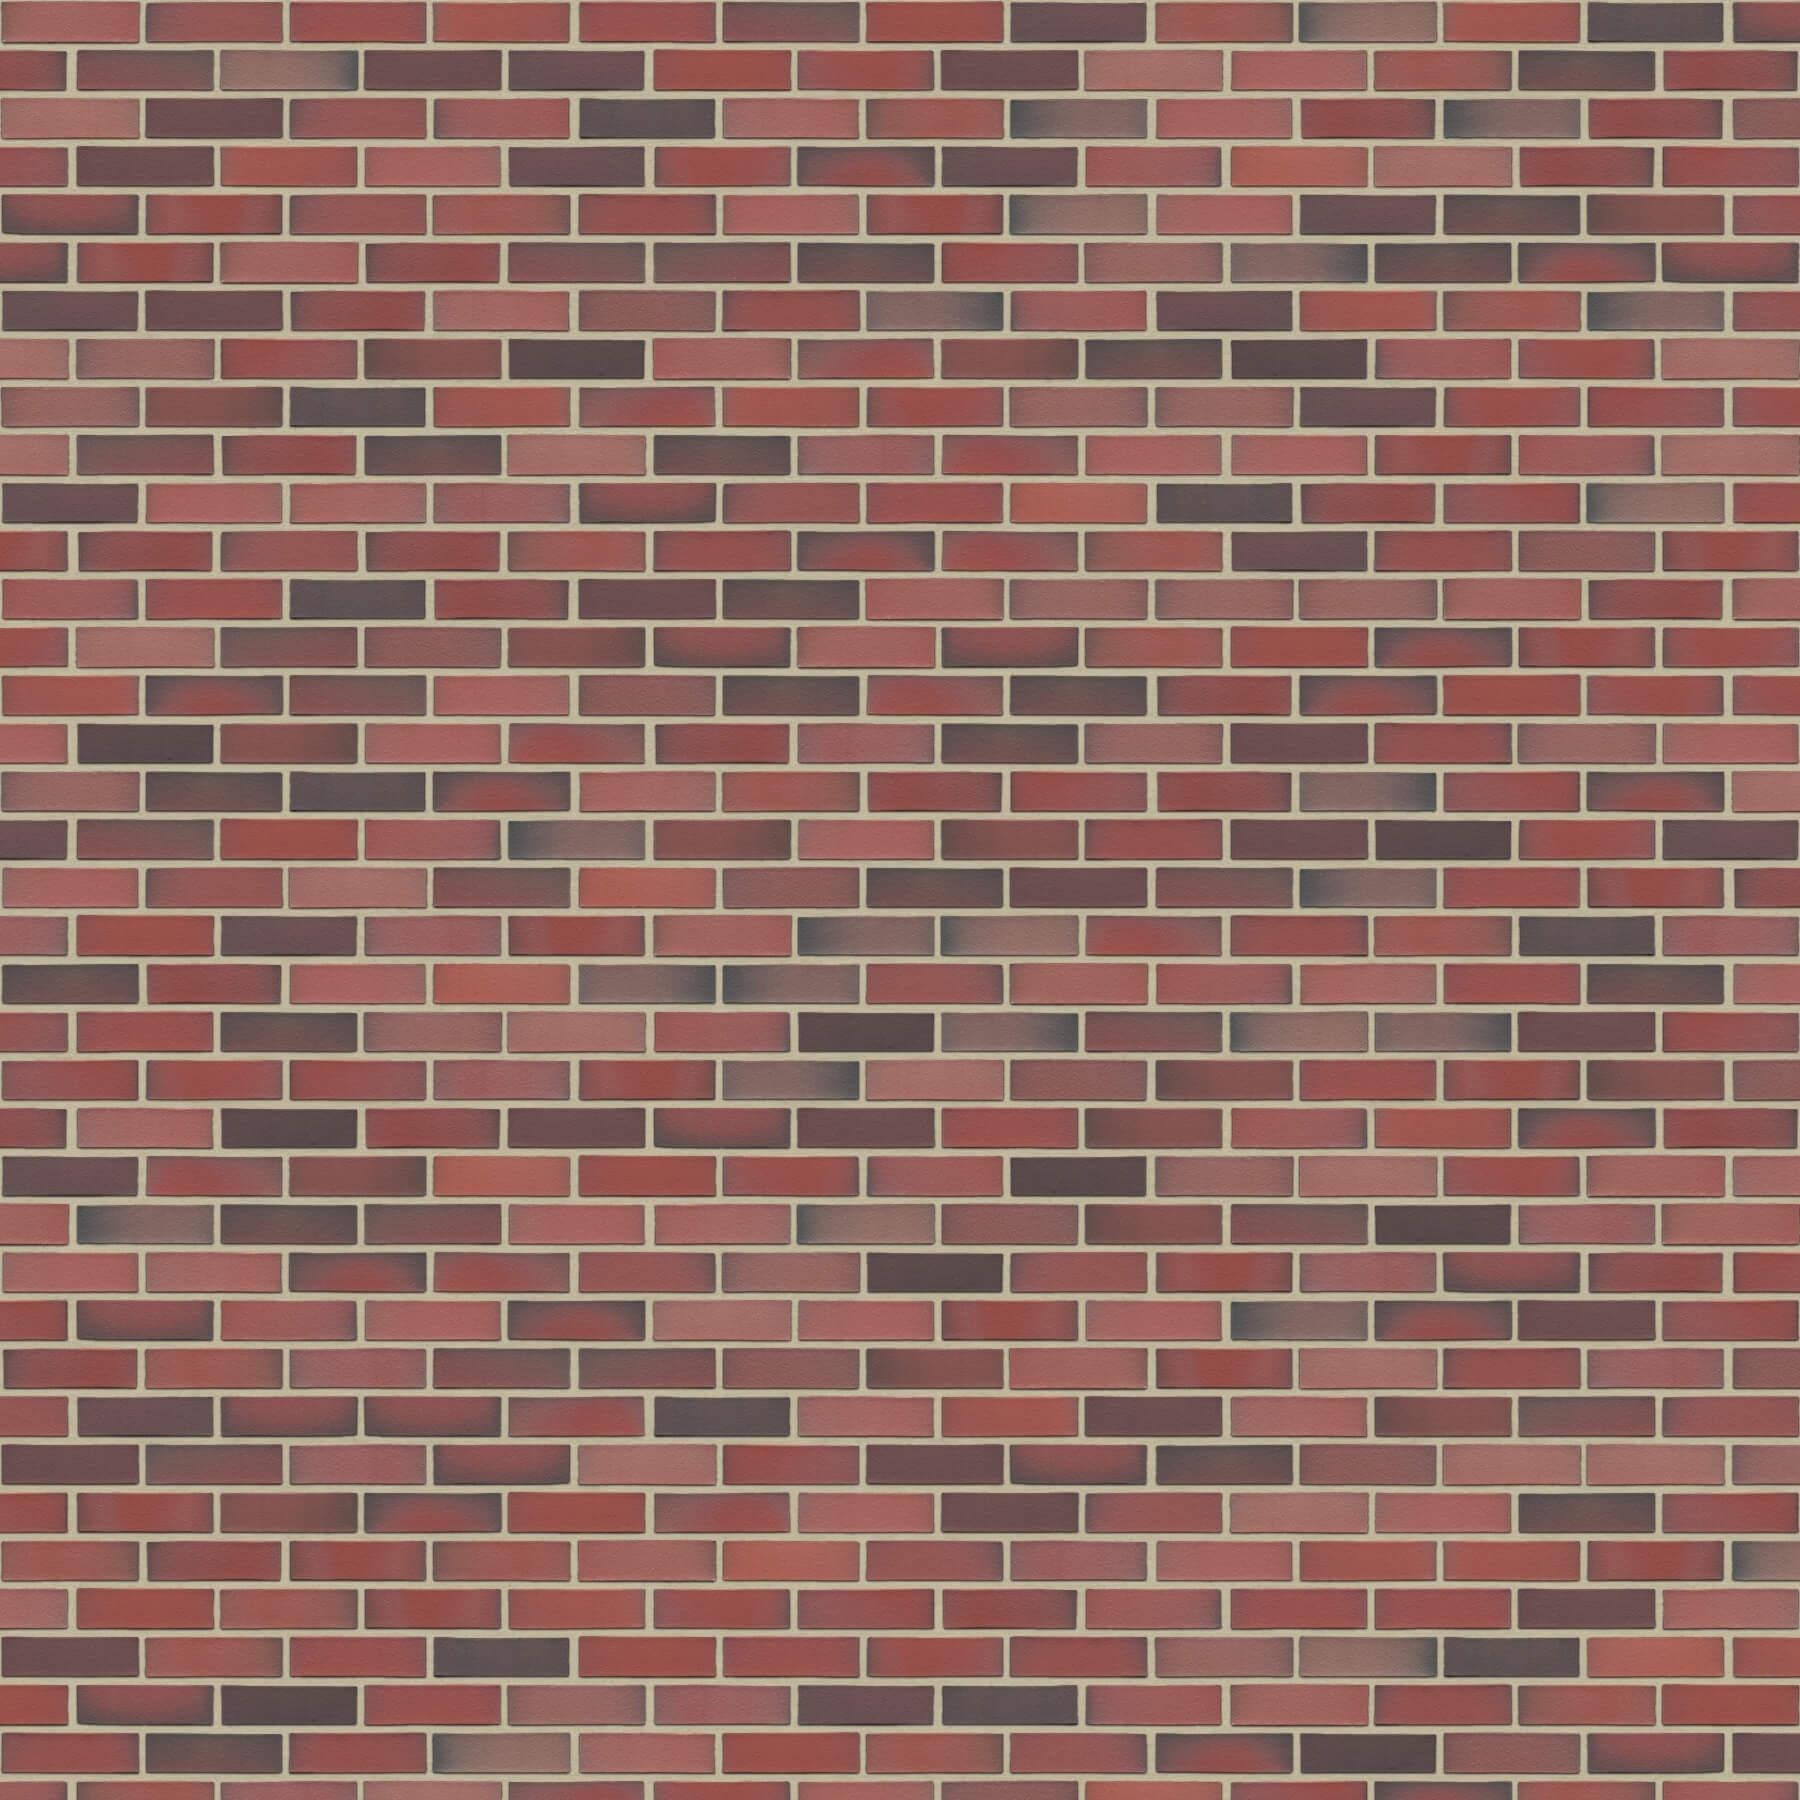 Puna-cigla-Feldhaus-Klinker-brick-house-nf-k-300-Bez Fuga